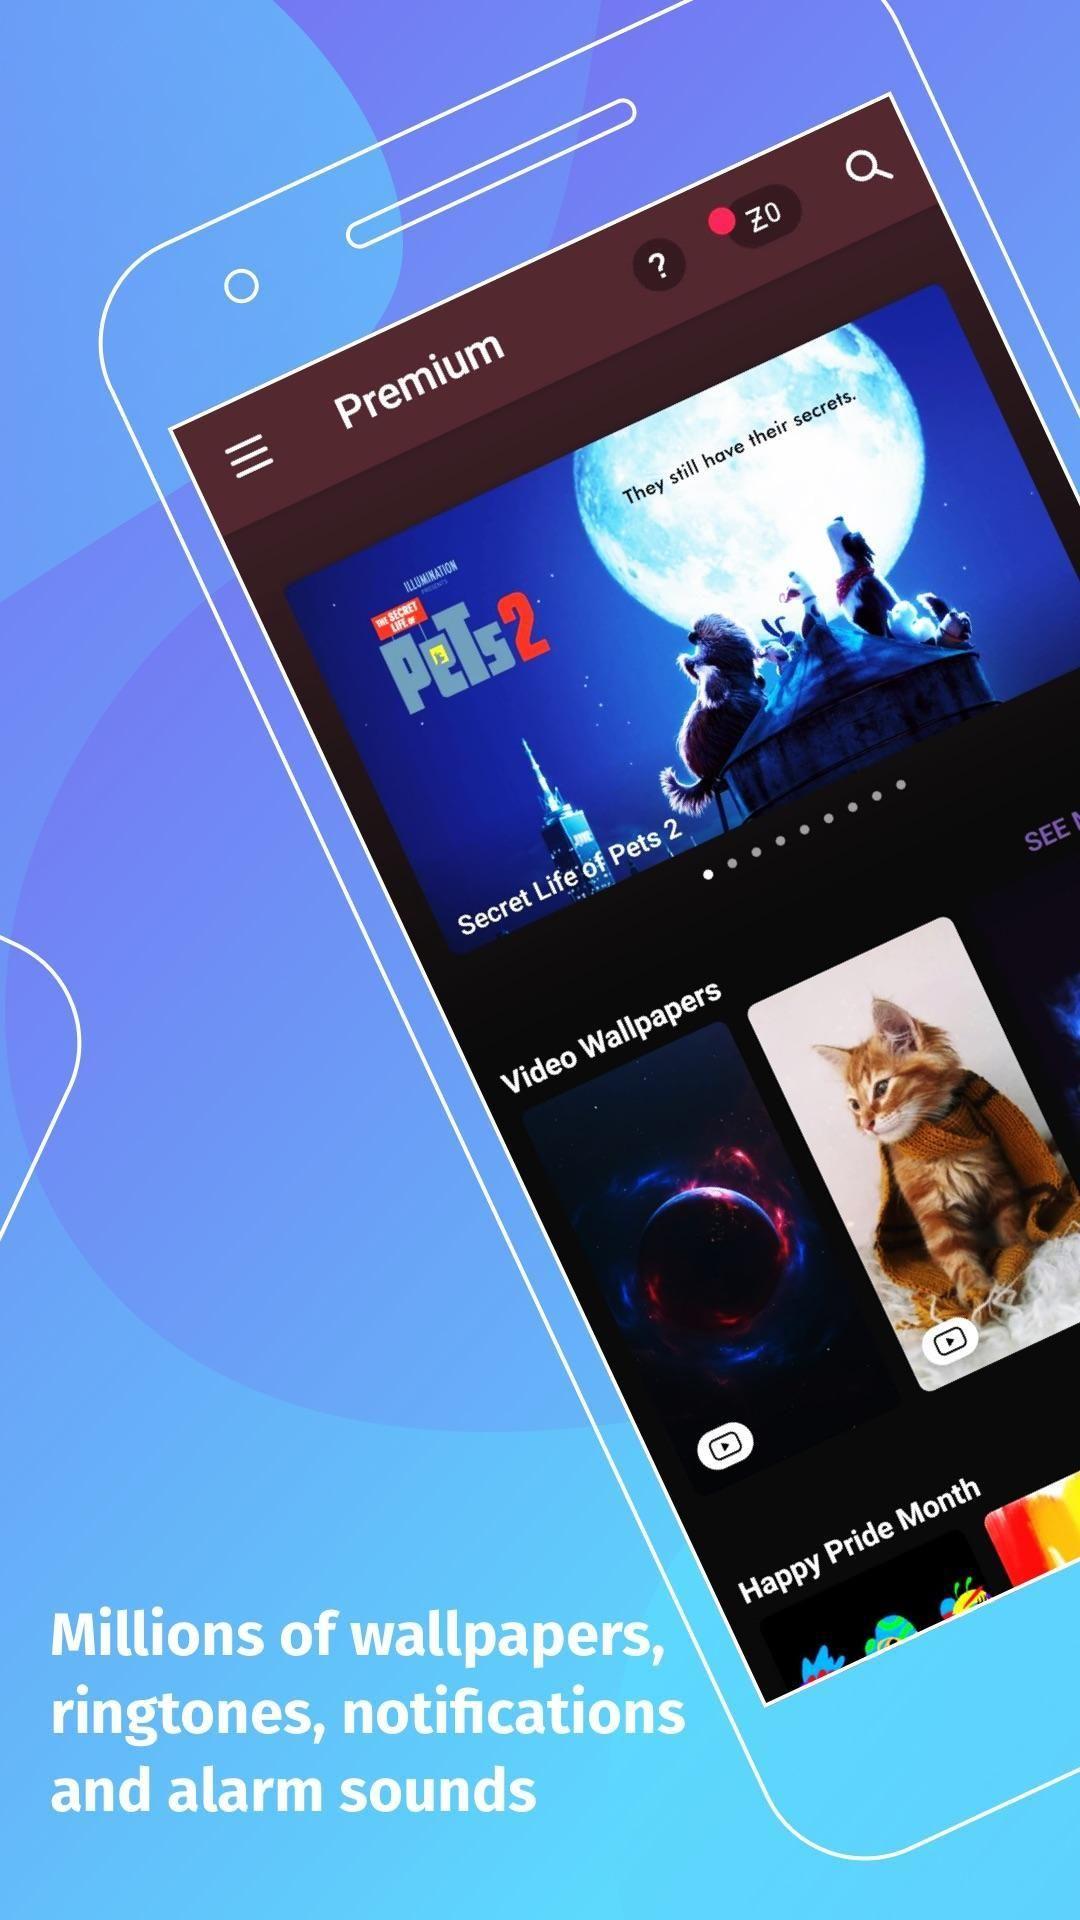 Zedge Wallpaper Home Screen in 2020 Android smartphone